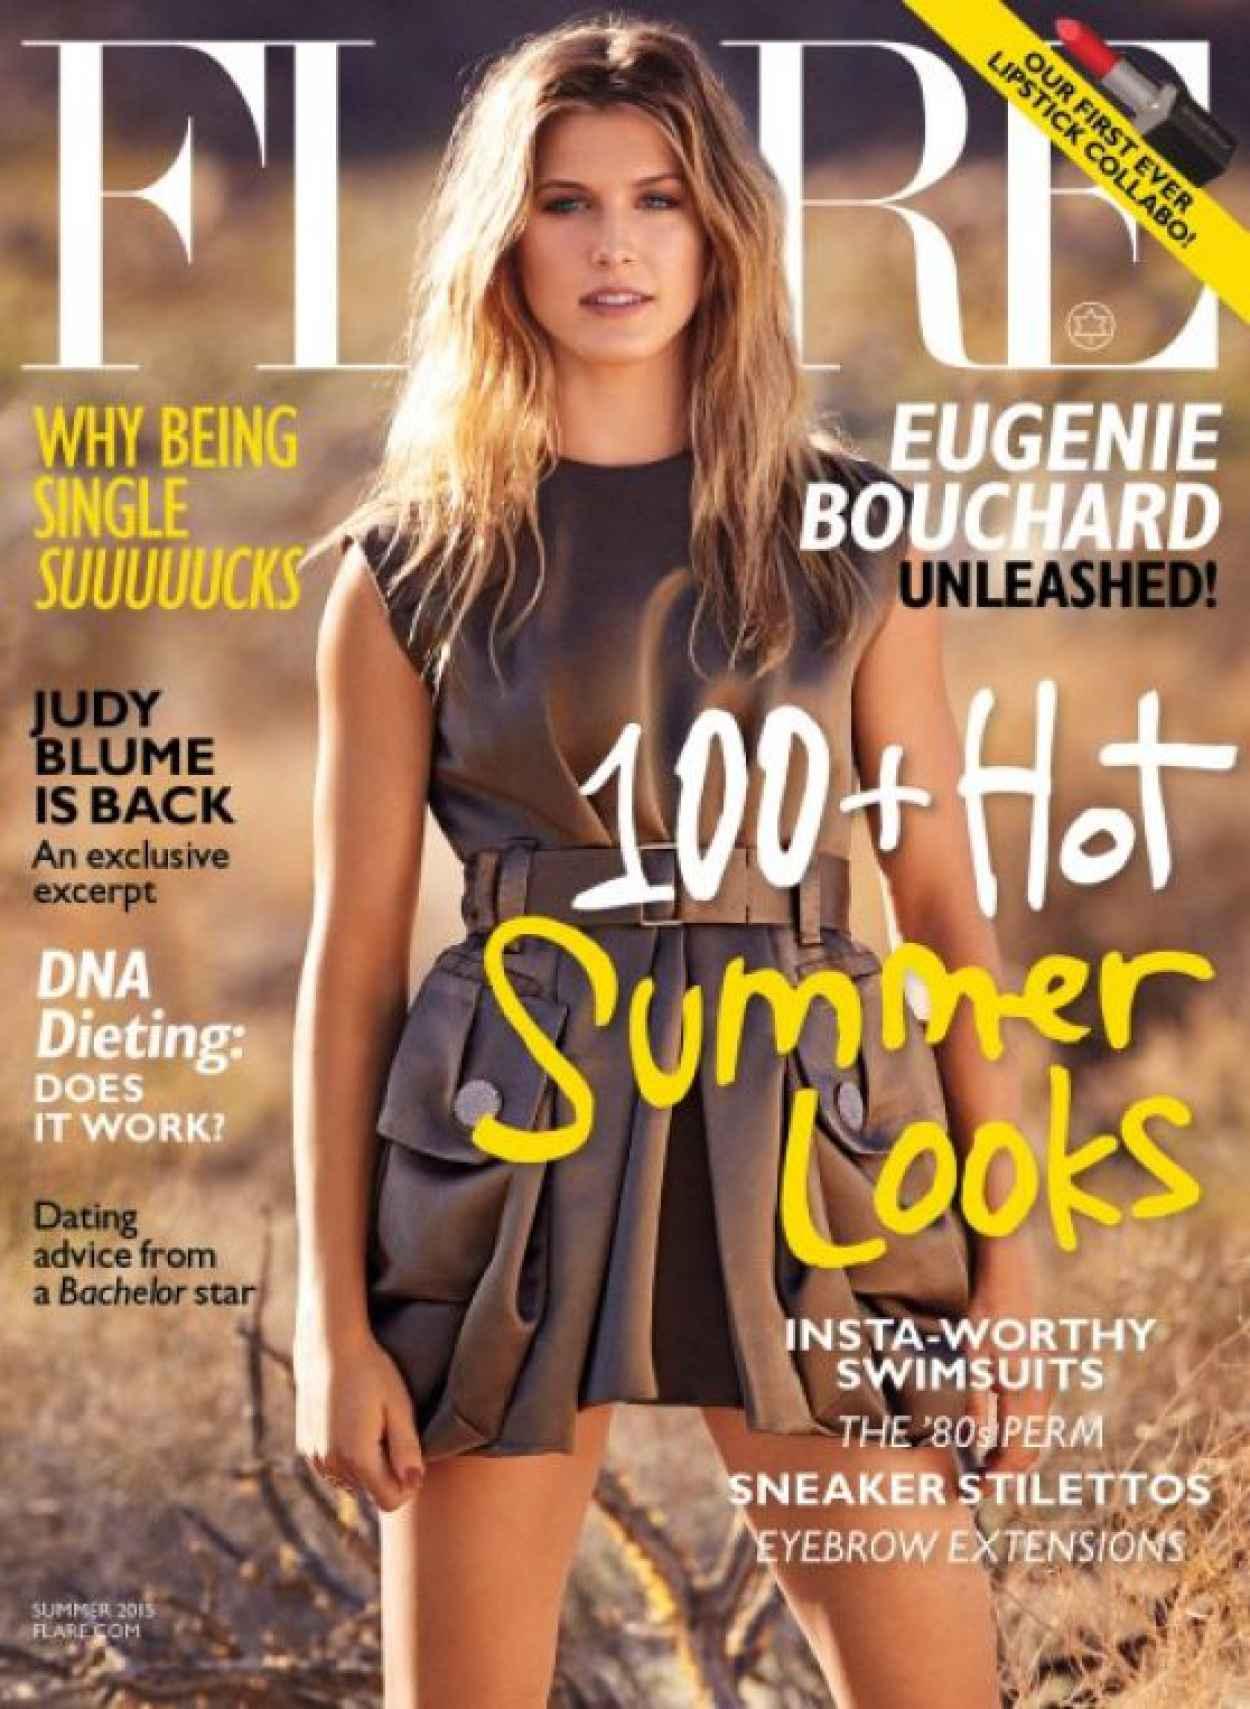 Eugenie Bouchard - Flare Magazine June 2015 Issue-2